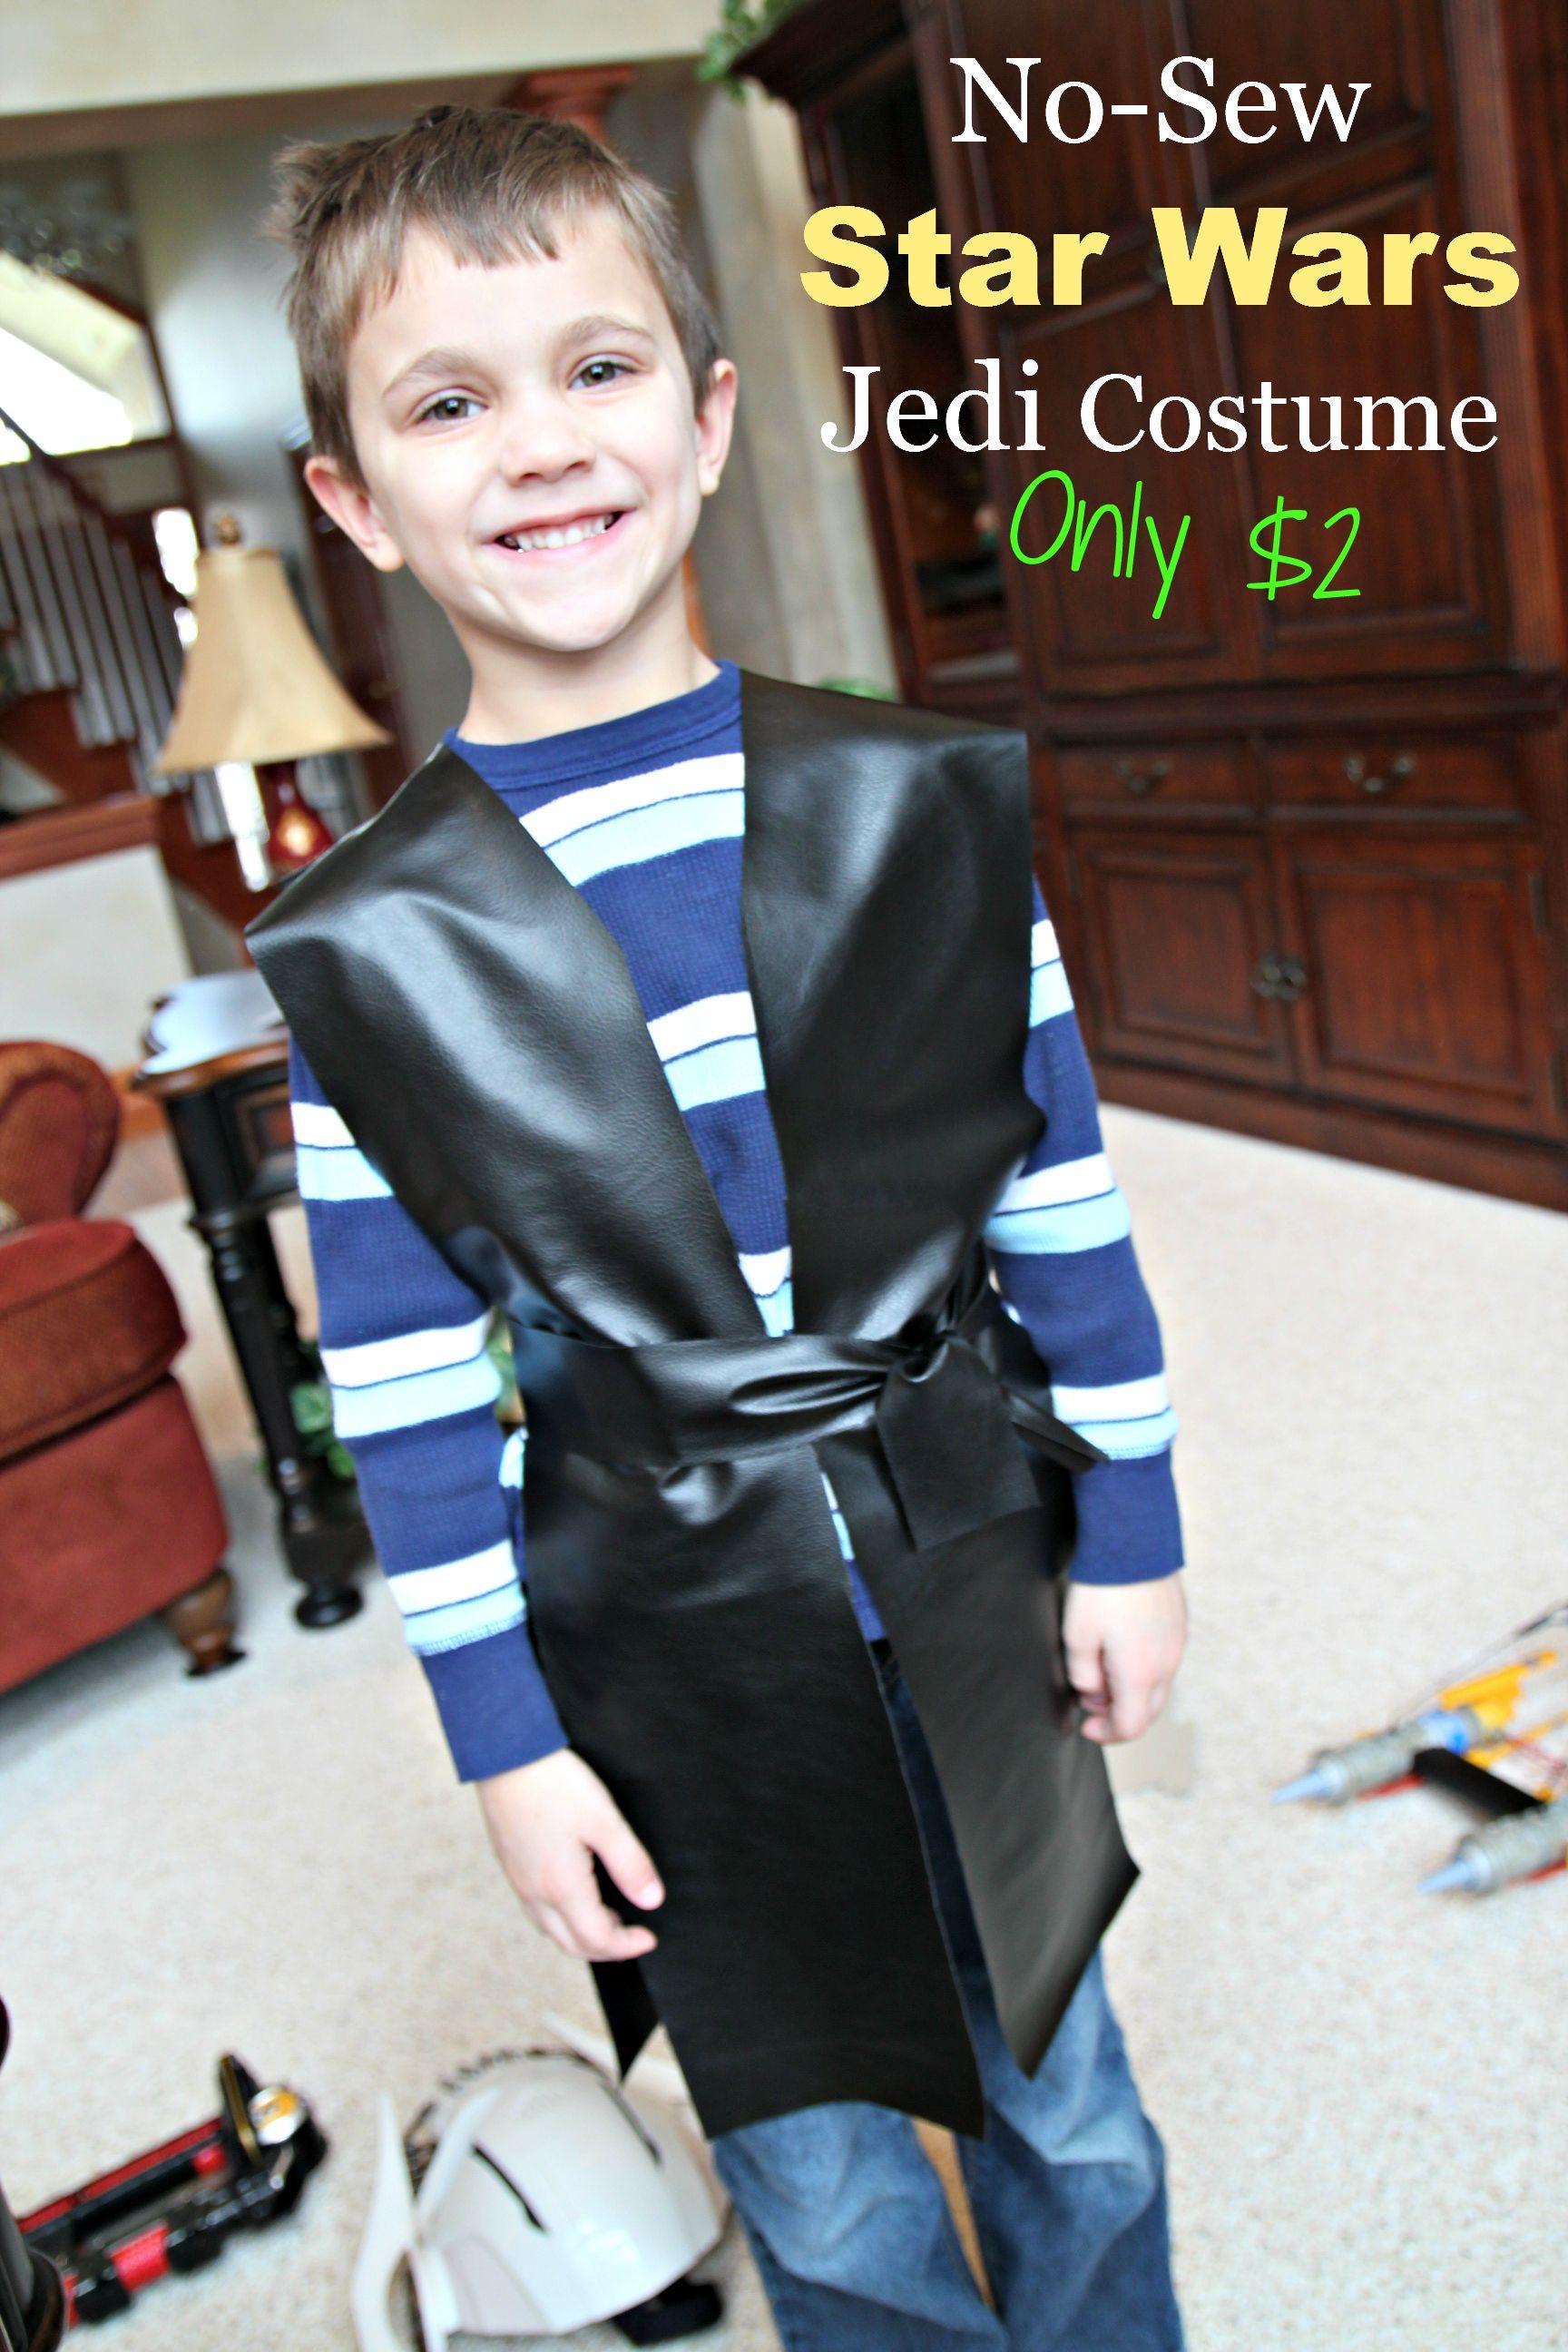 Star Wars Anakin Jedi No-Sew Costume